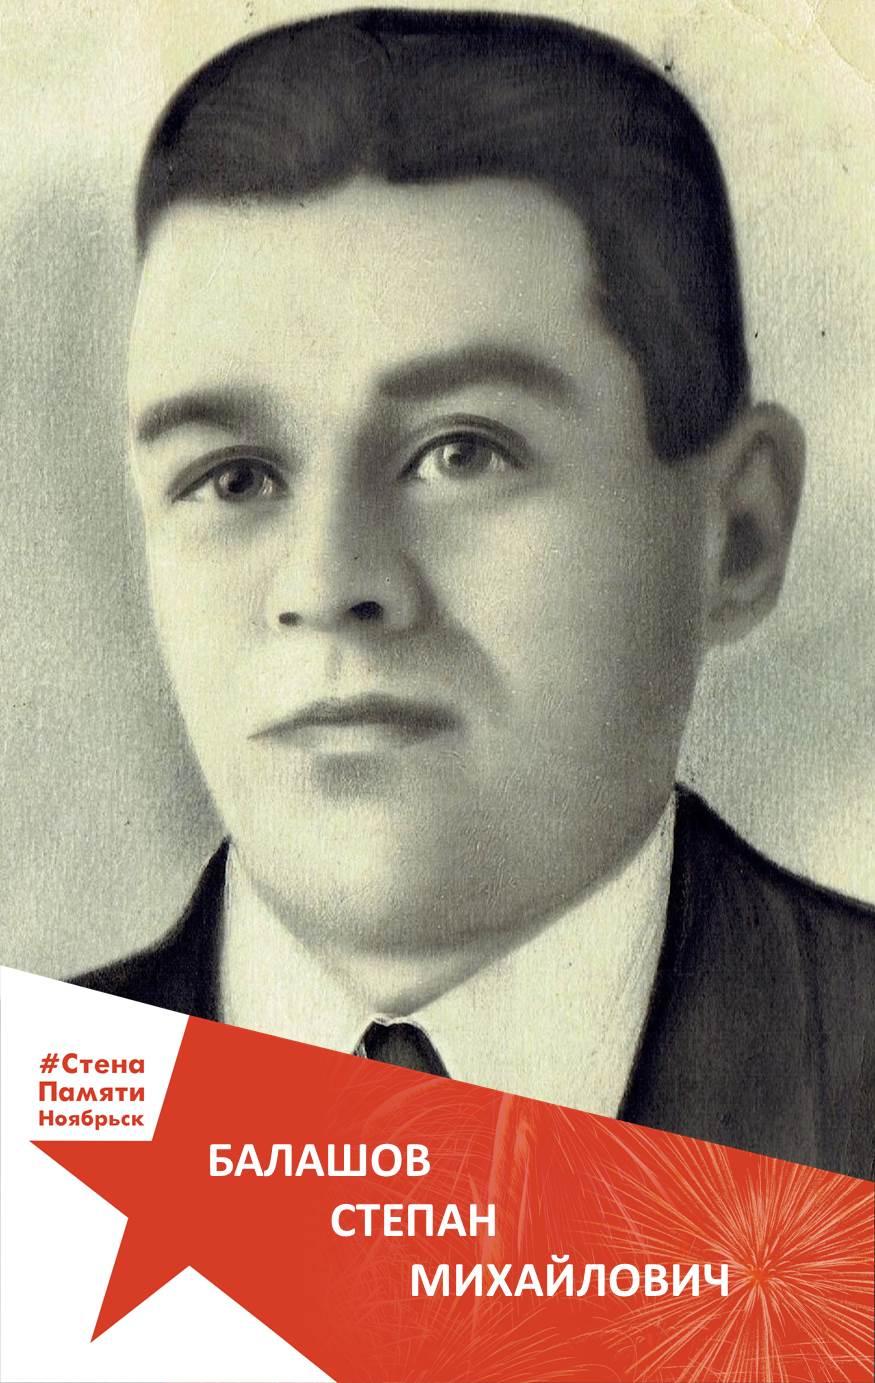 Балашов Степан Михайлович